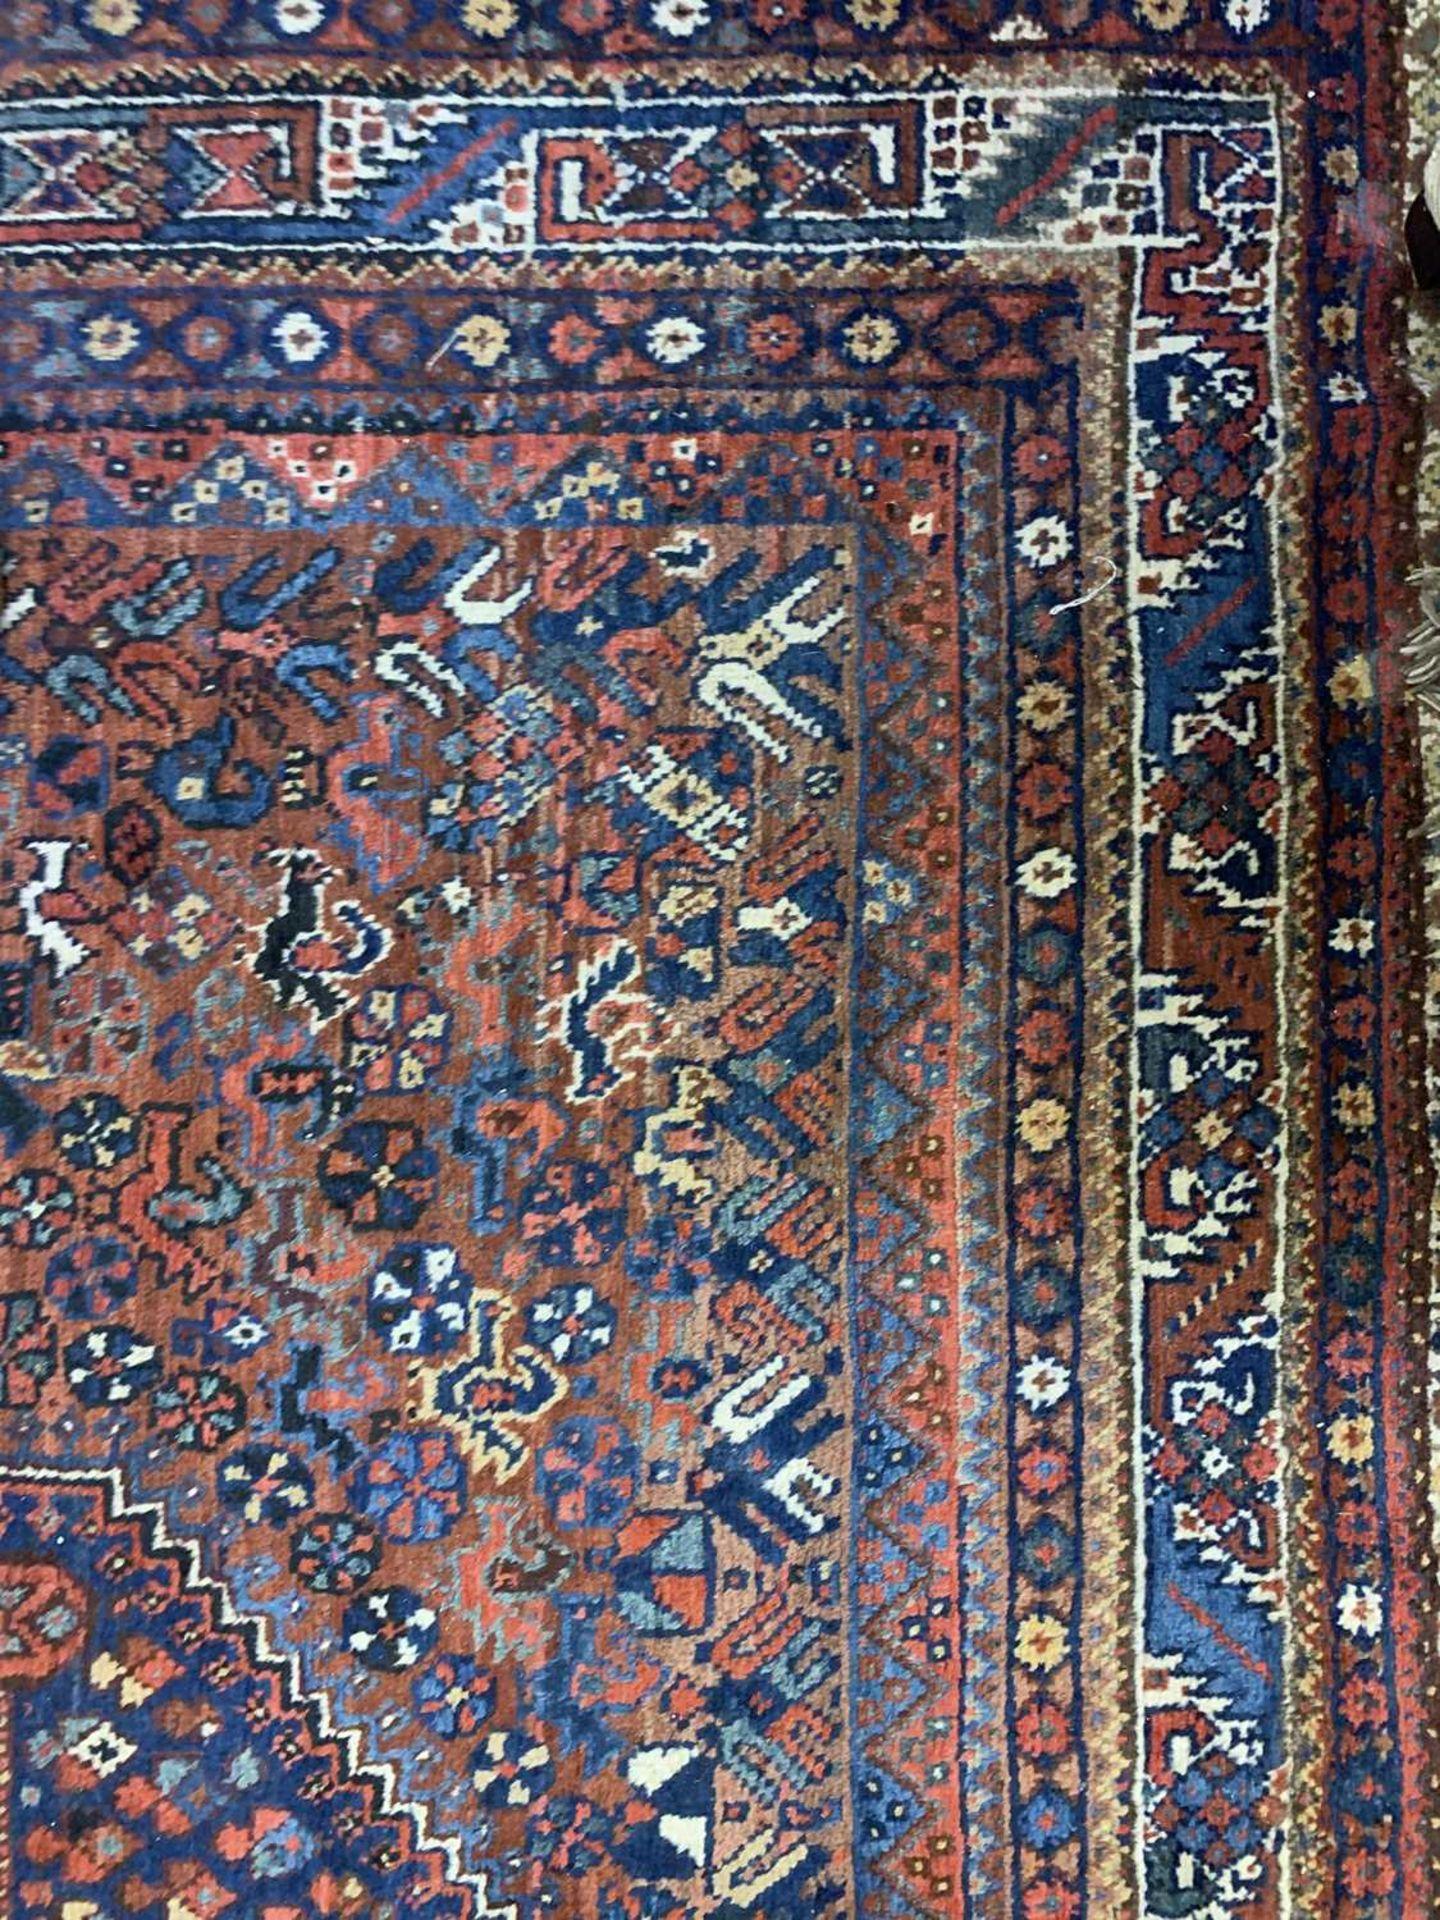 A South West Persian Khamseh carpet, - Image 4 of 17